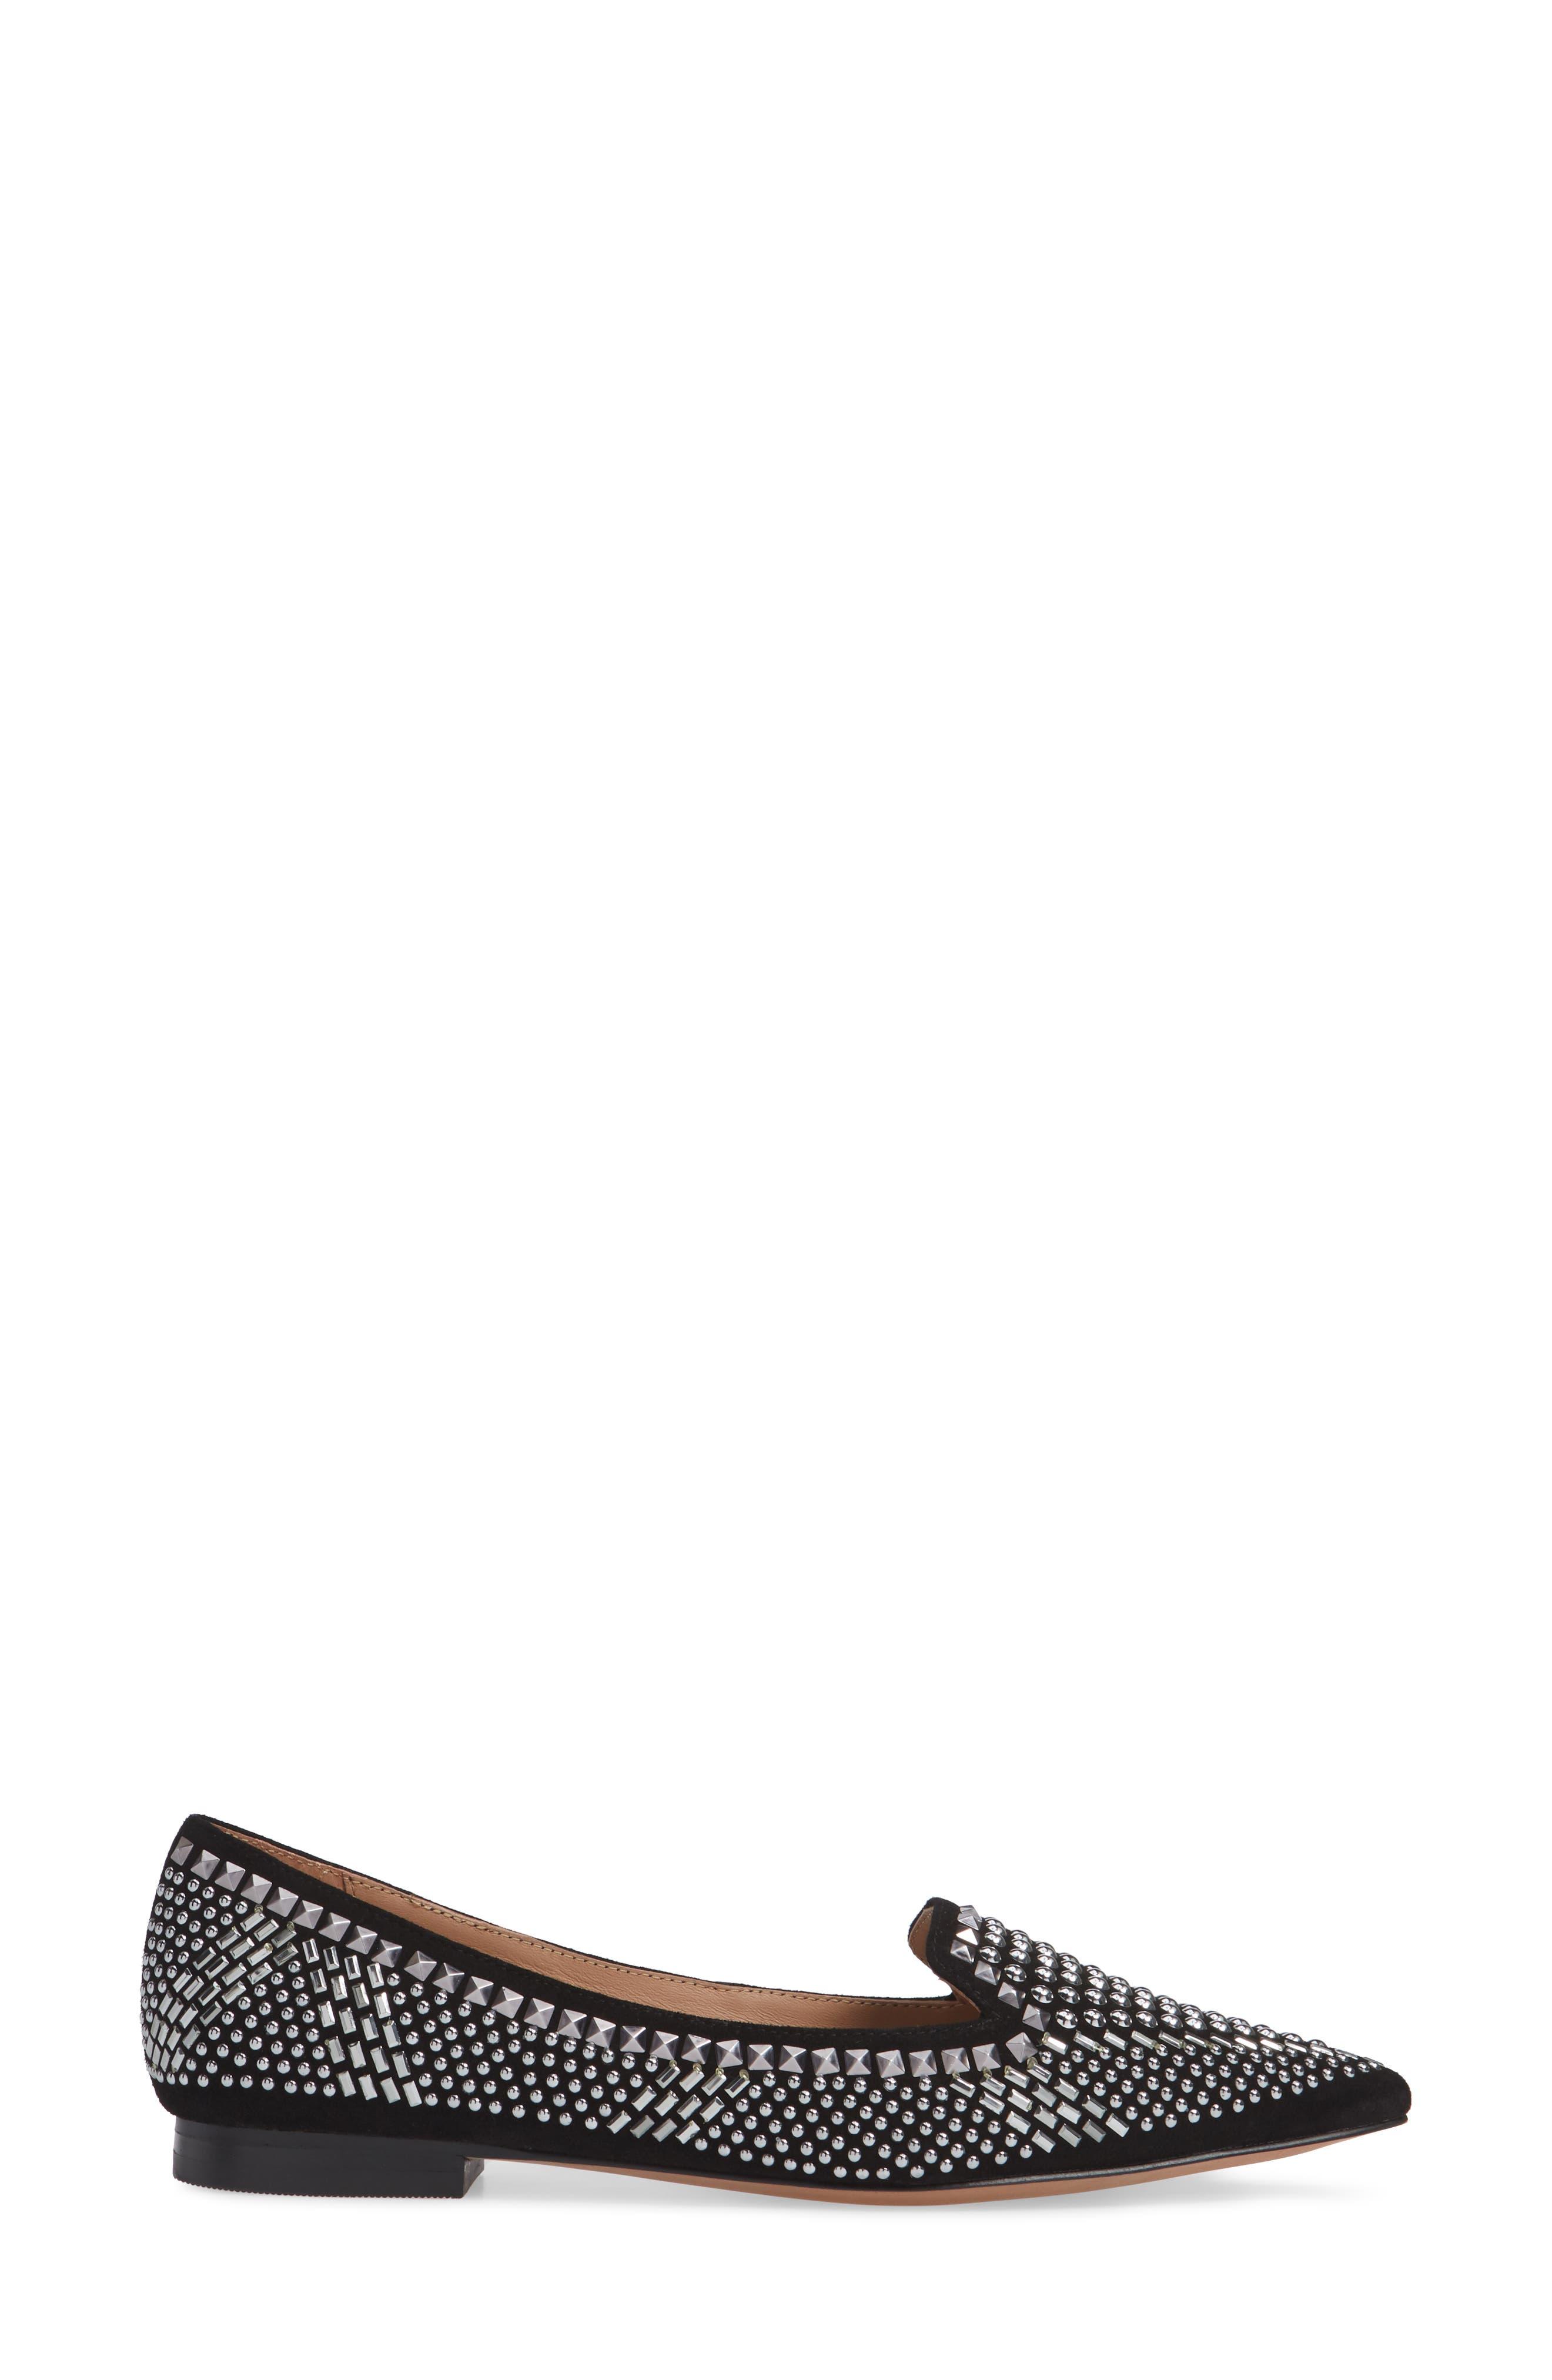 Portia Studded Loafer,                             Alternate thumbnail 3, color,                             BLACK SUEDE